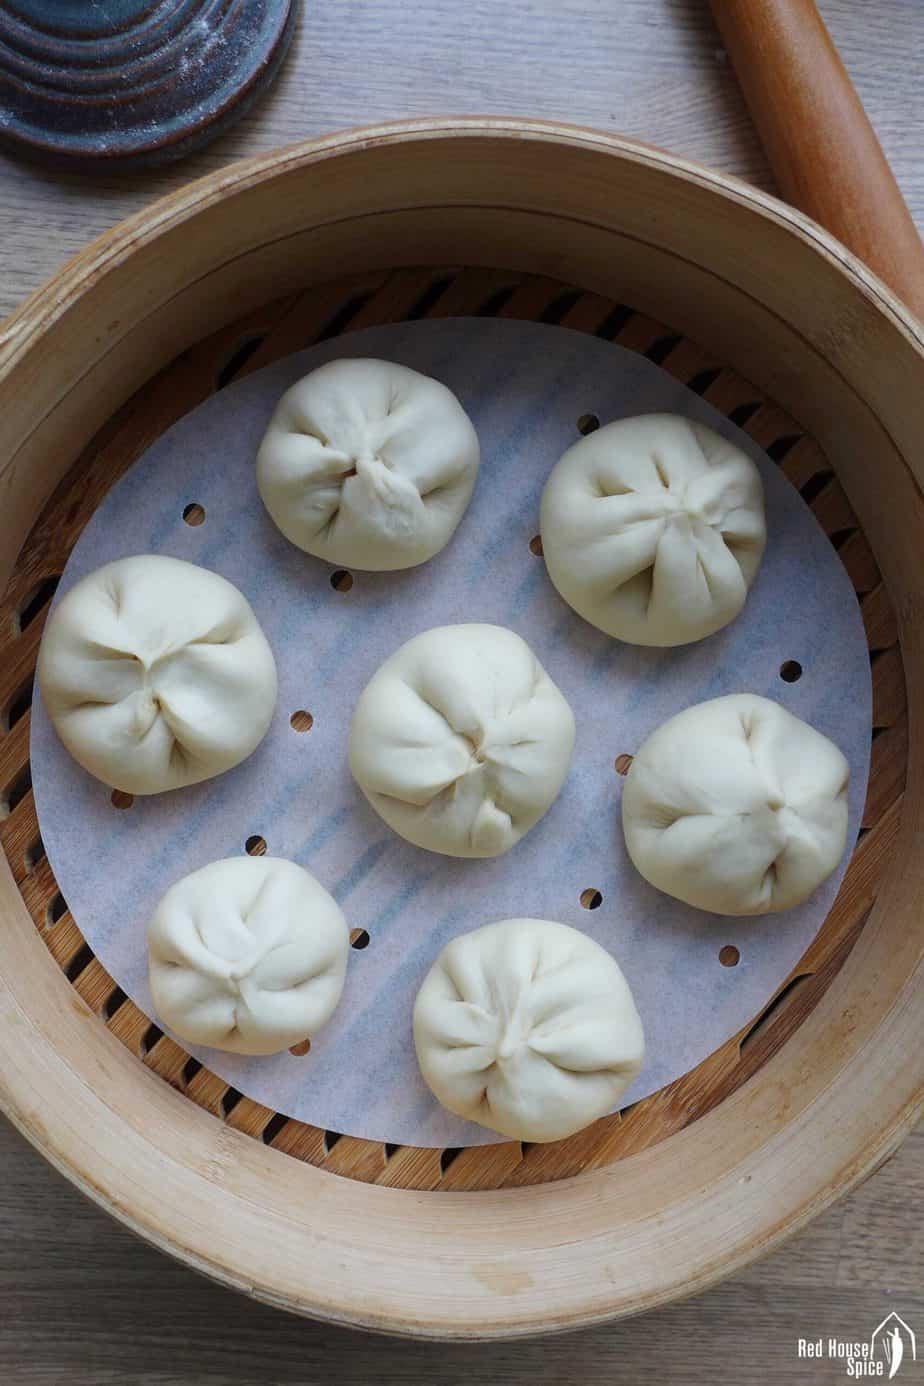 Uncooked Char Siu Bao inside a bamboo steamer